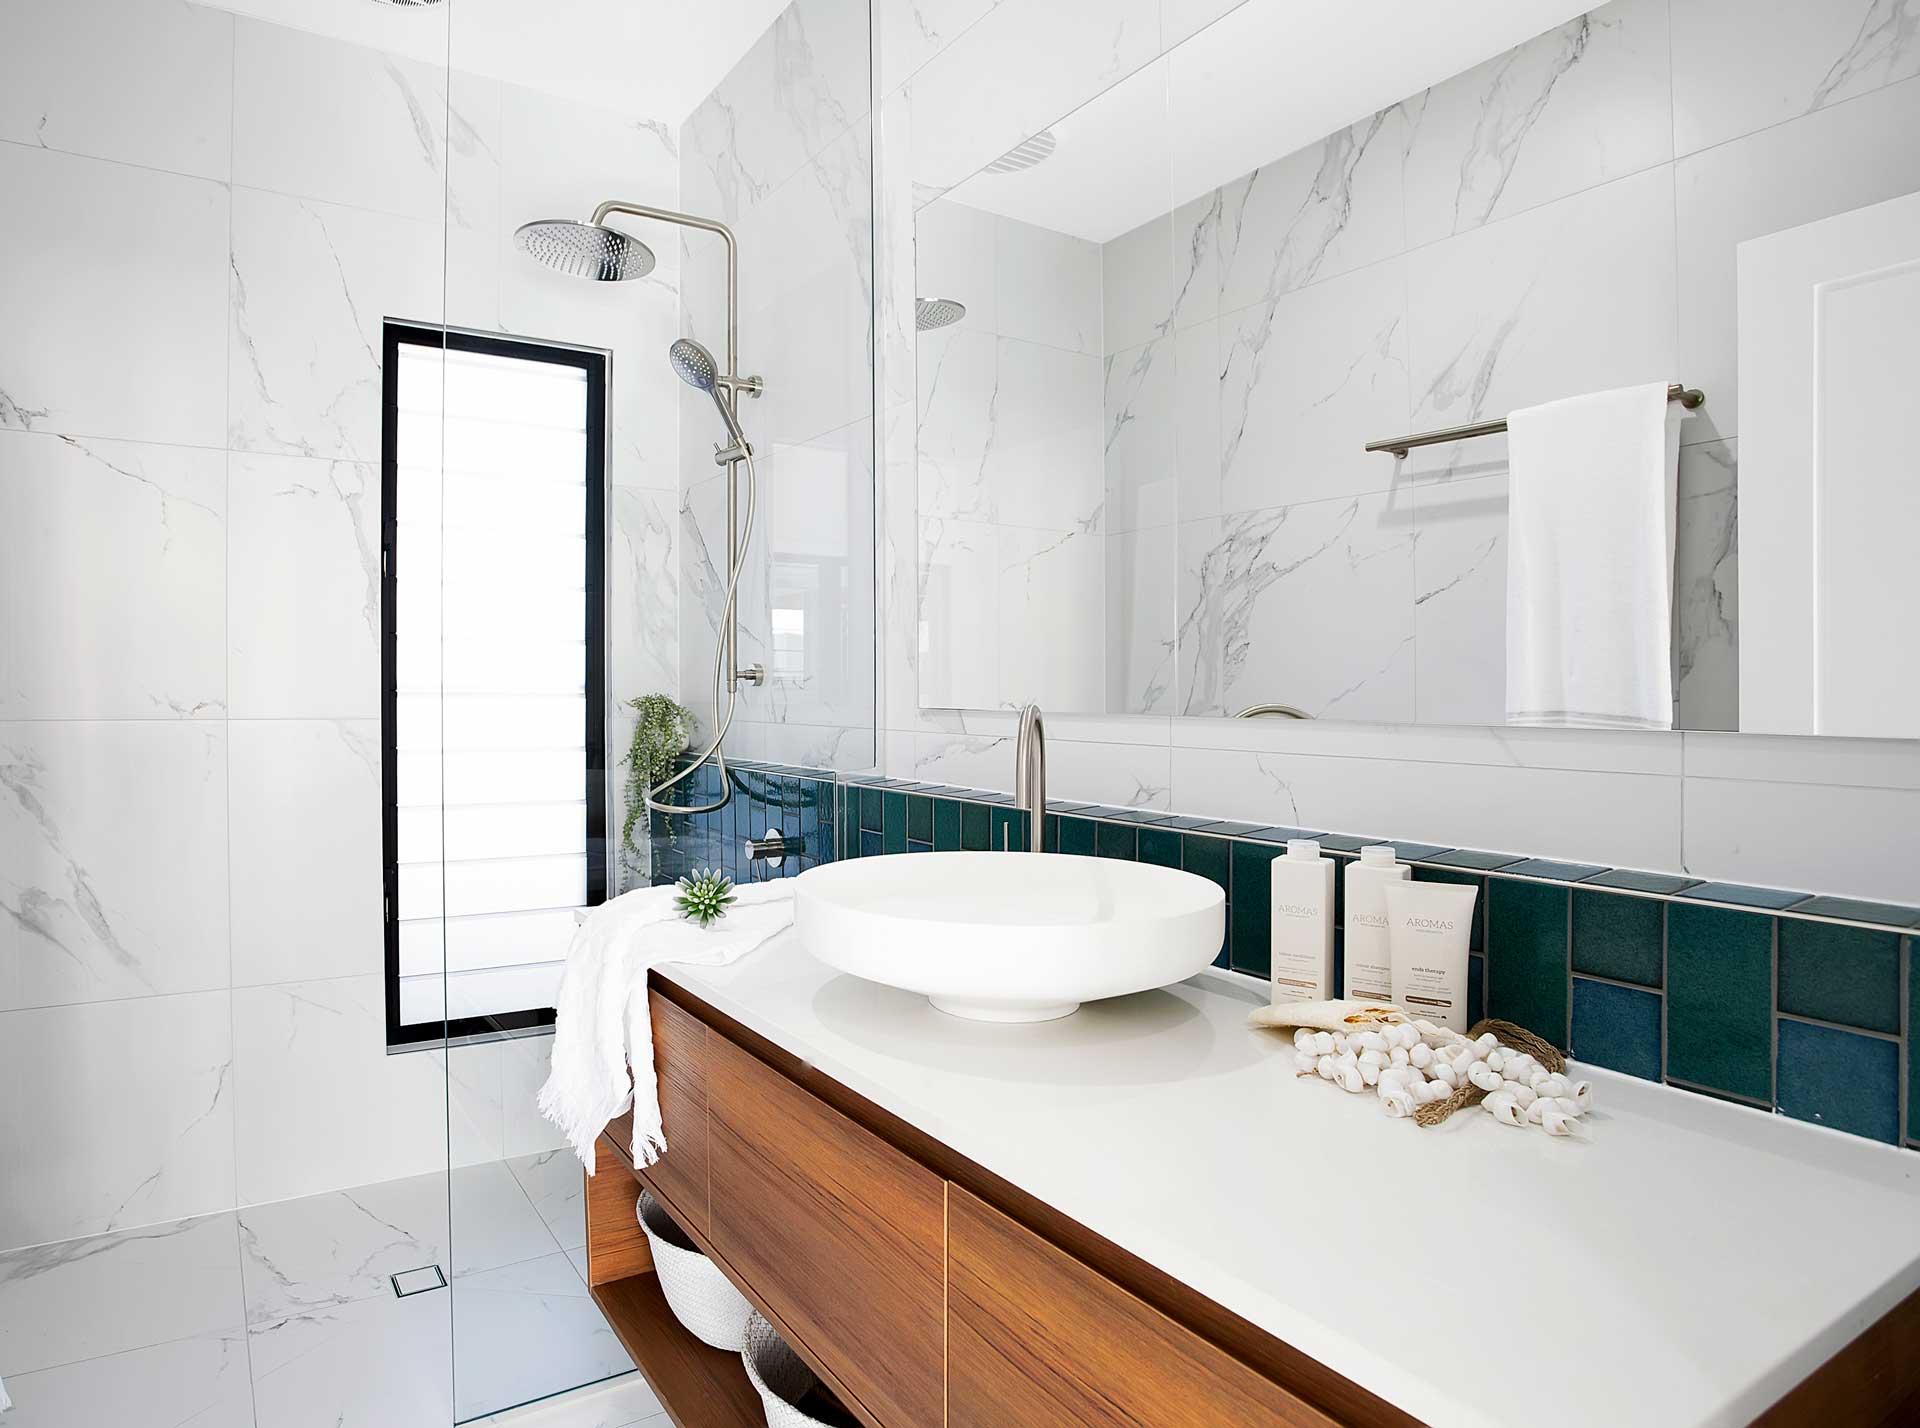 Logan bathroom